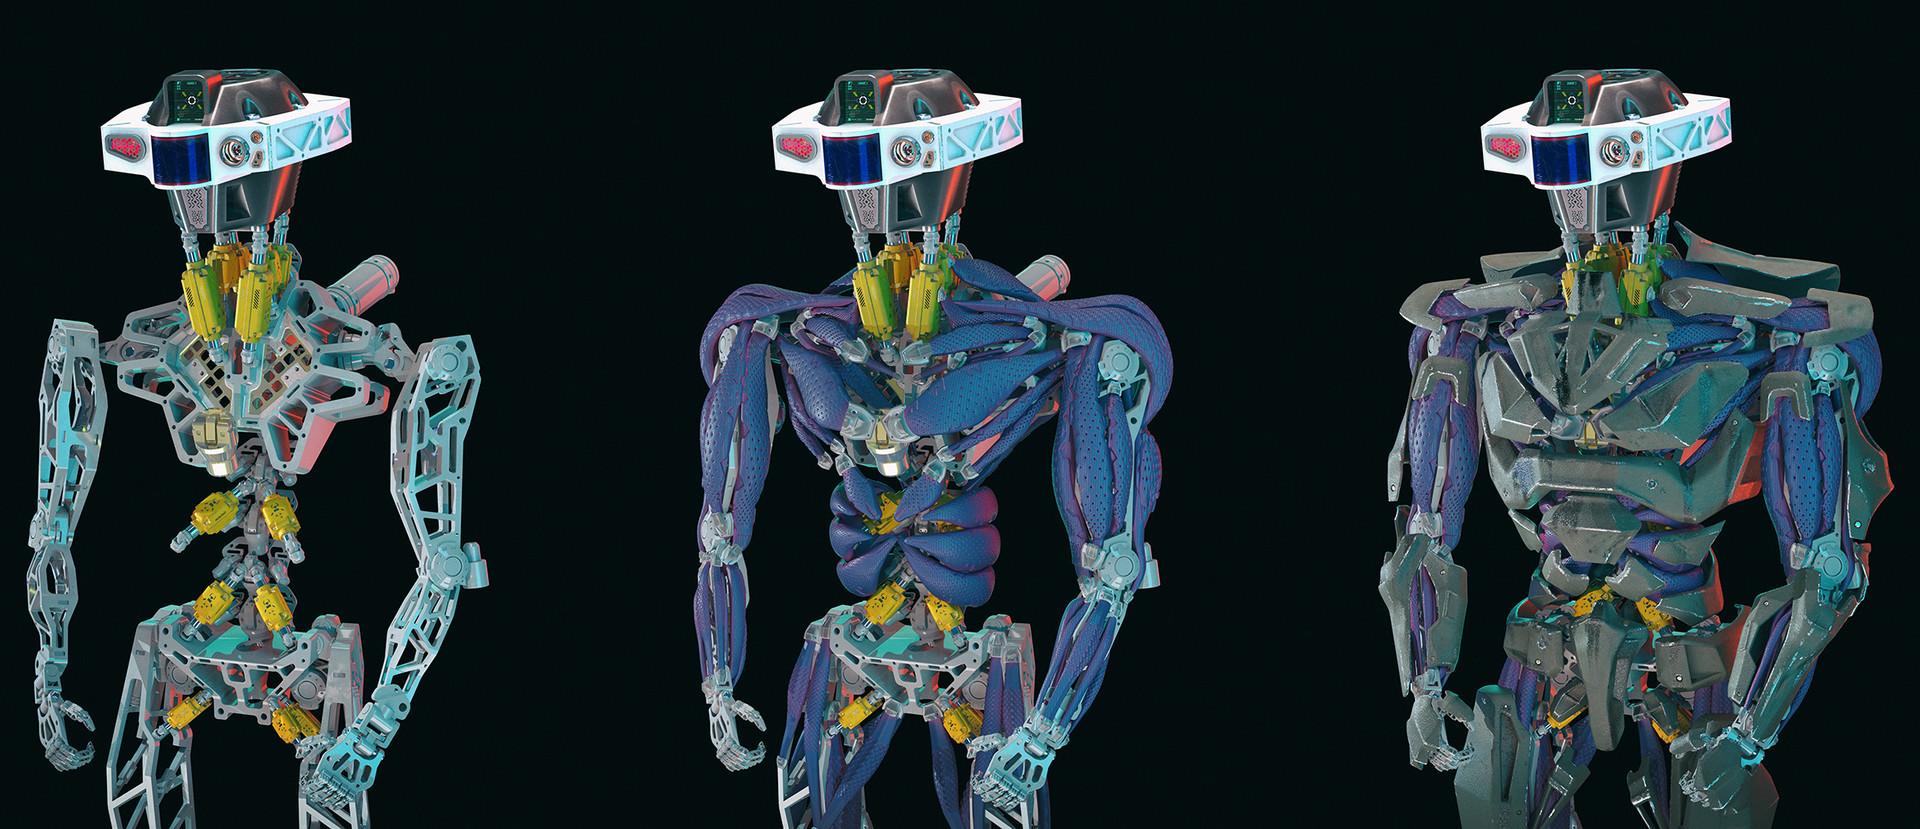 frame -> muscles -> armor